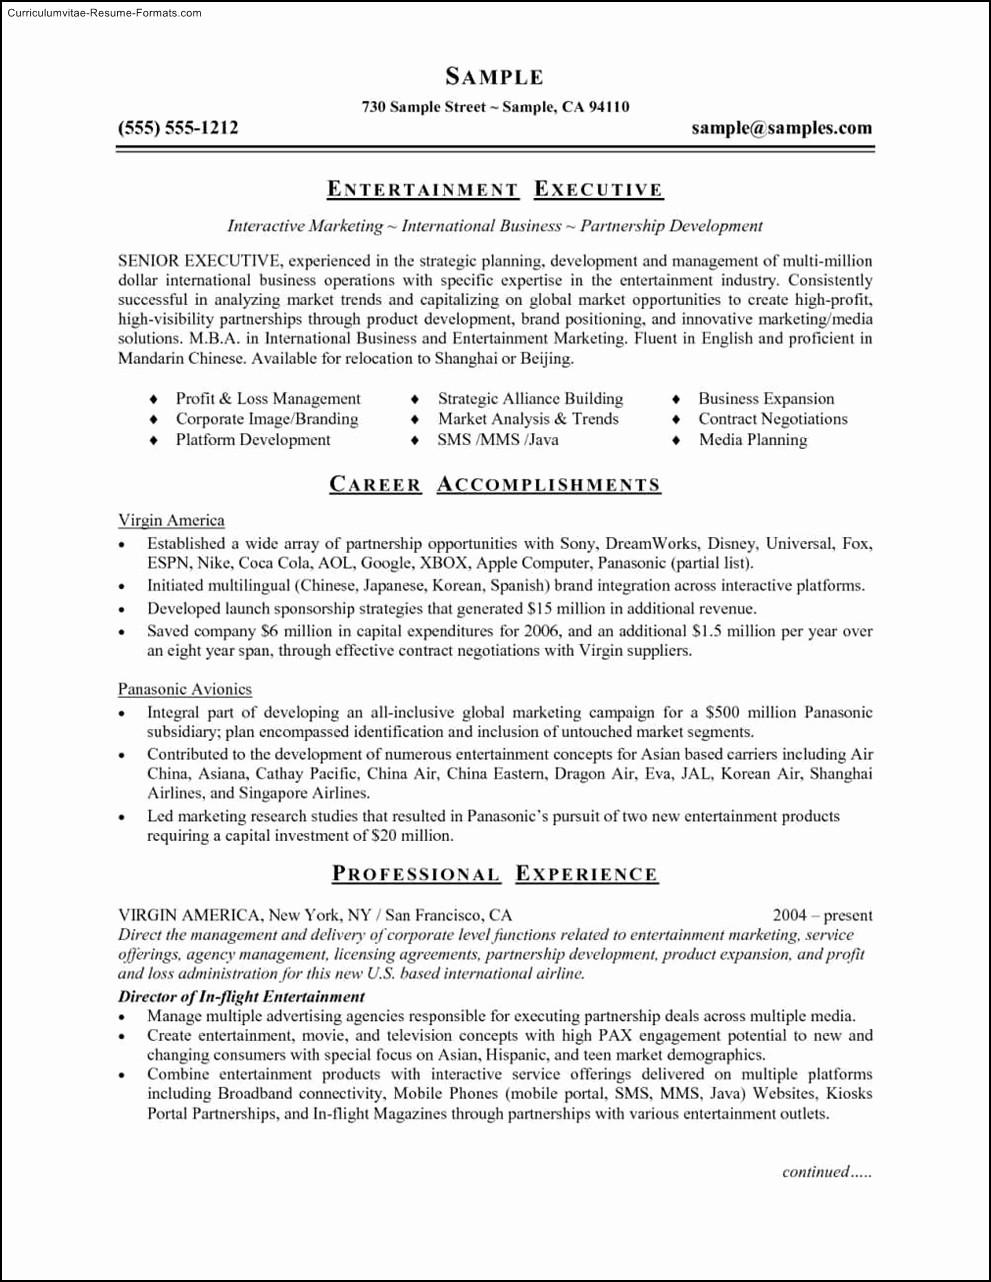 Microsoft Office Online Resume Template Elegant Ms Fice 2007 Resume Templates Free Samples Examples